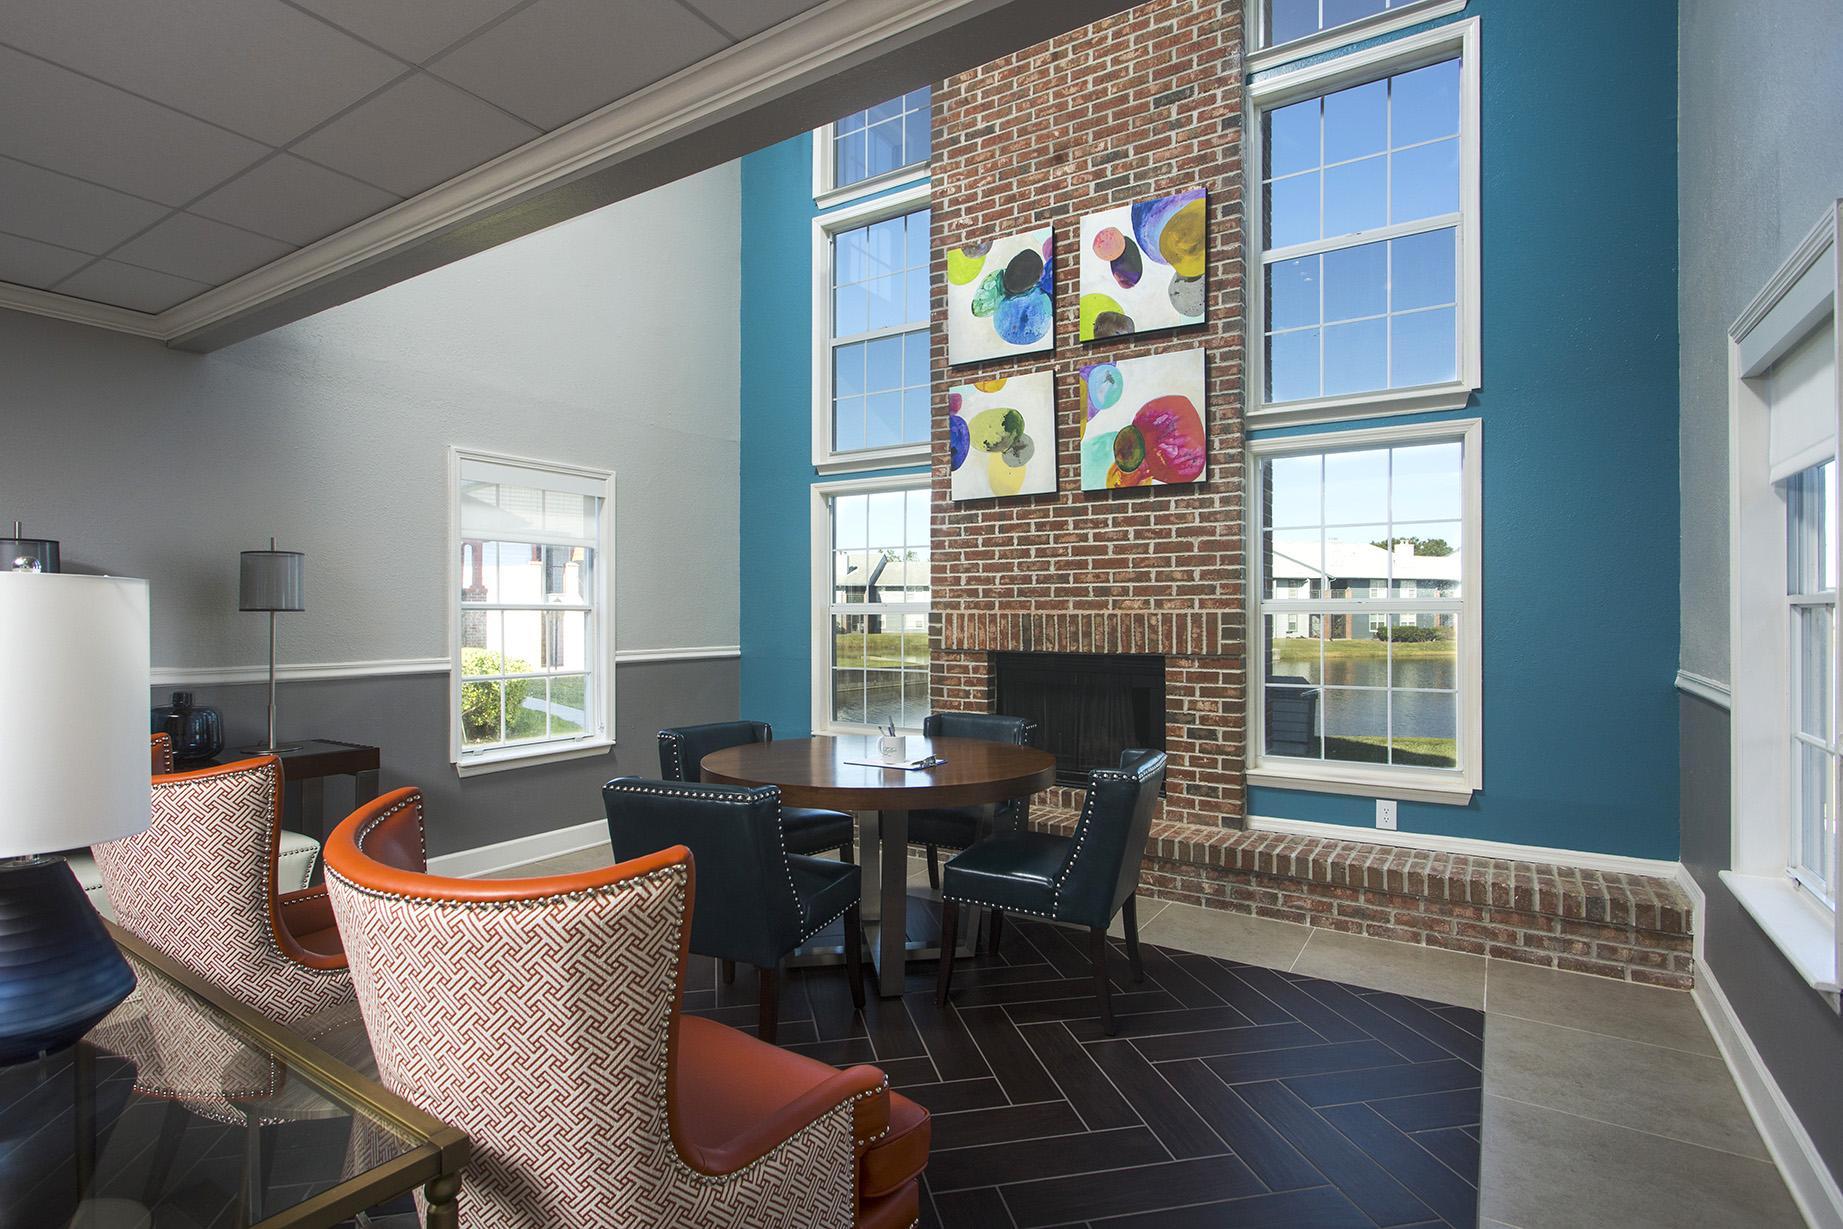 CharlestonLandings-Rental-Apartment-Brandon-Florida-Media-Center2.jpg